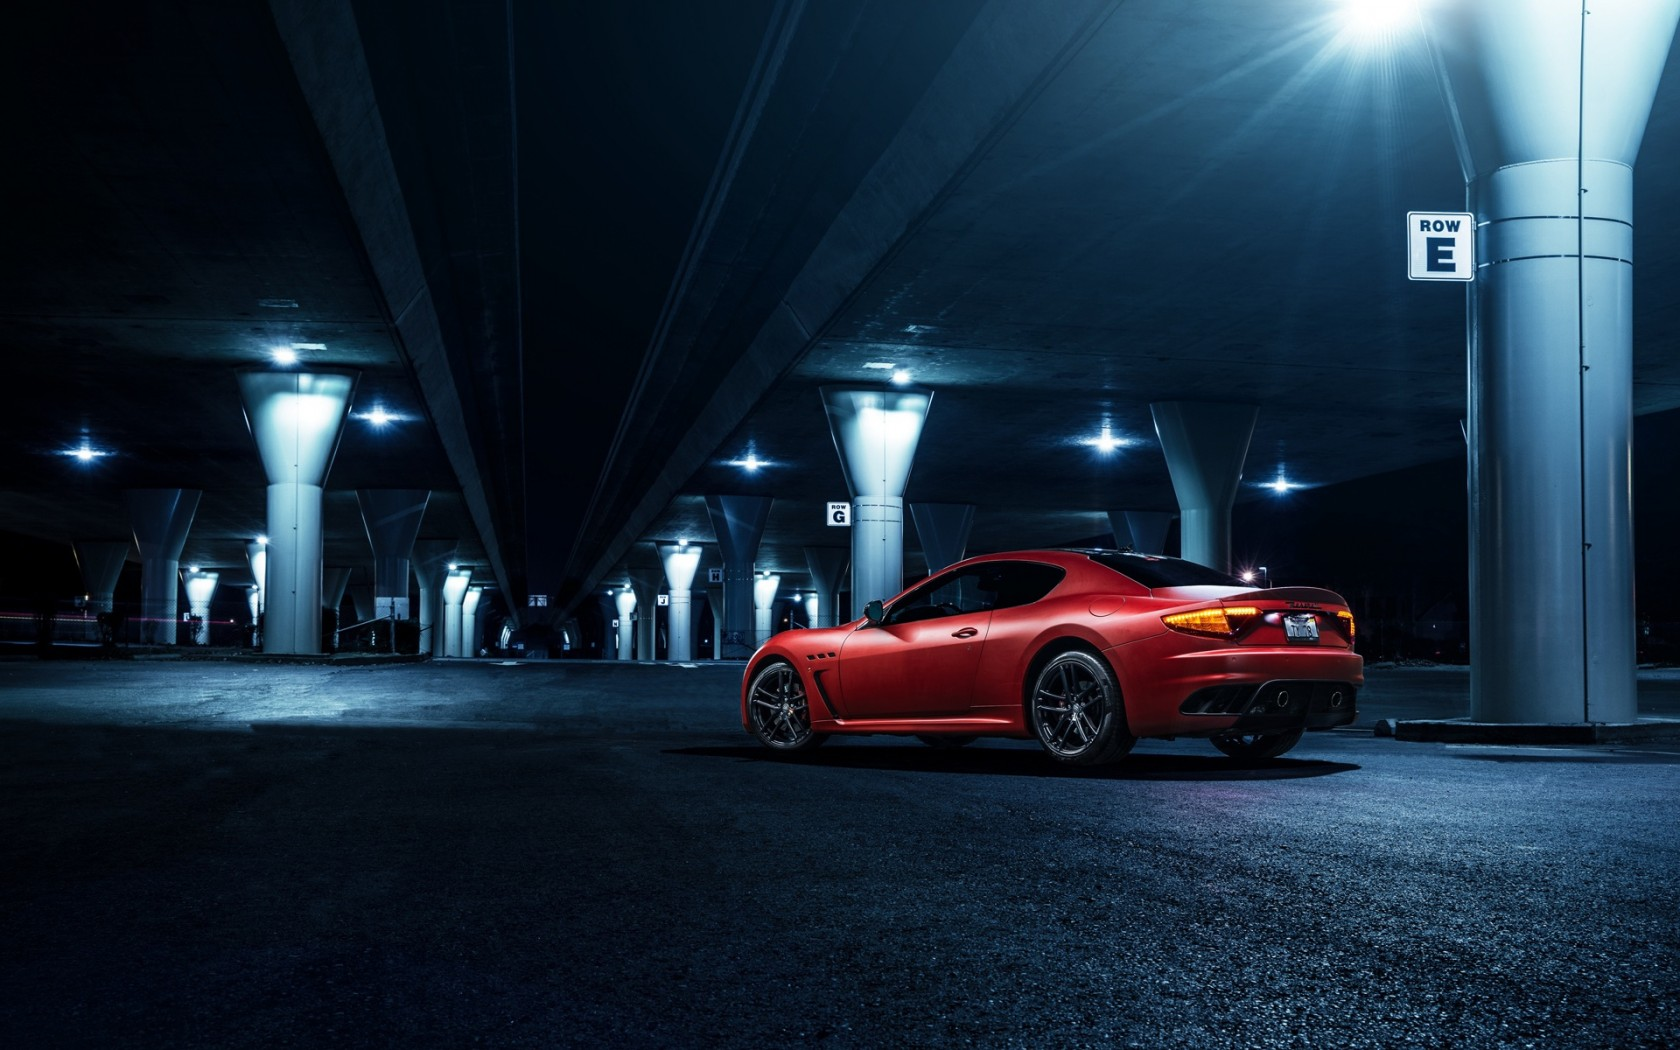 Rolls Royce Wallpaper Iphone X Maserati Granturismo Mc Sportline Wallpaper Hd Car